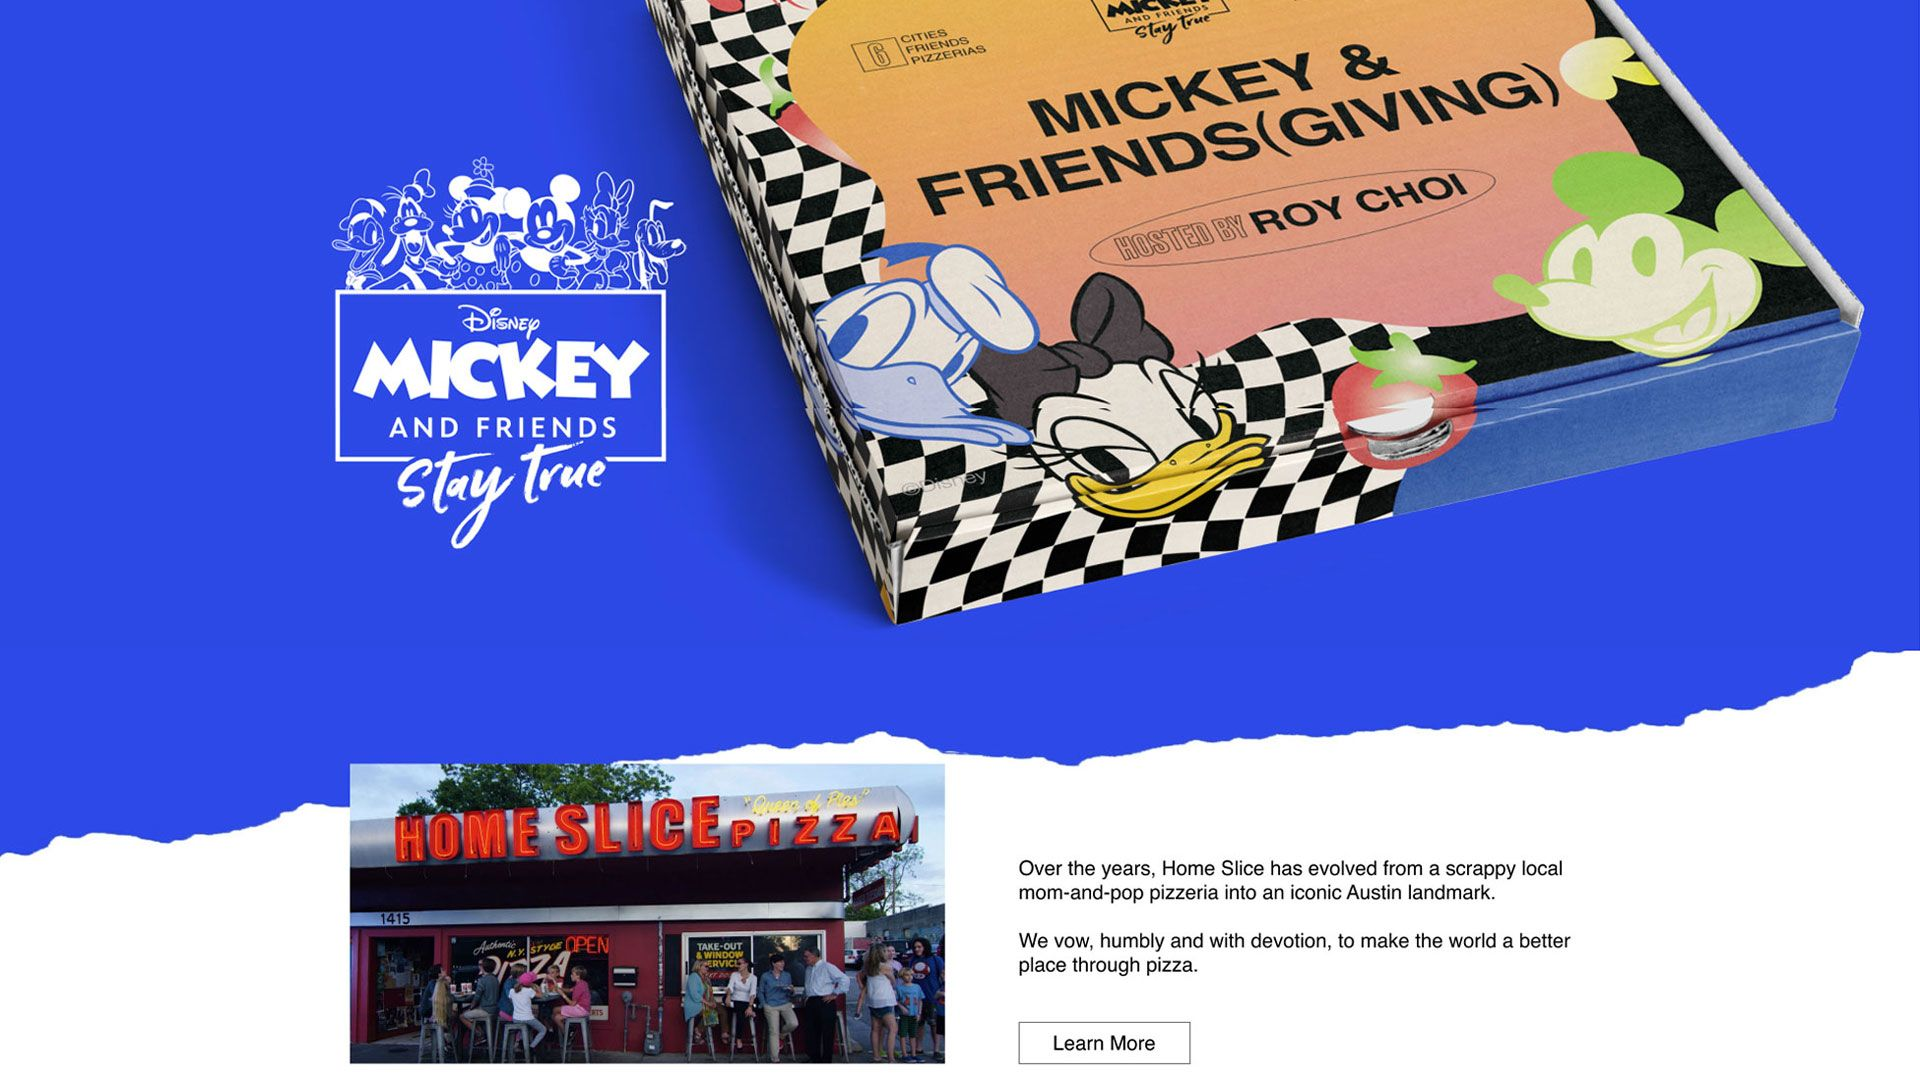 Disney's Mickey and Friends stay true